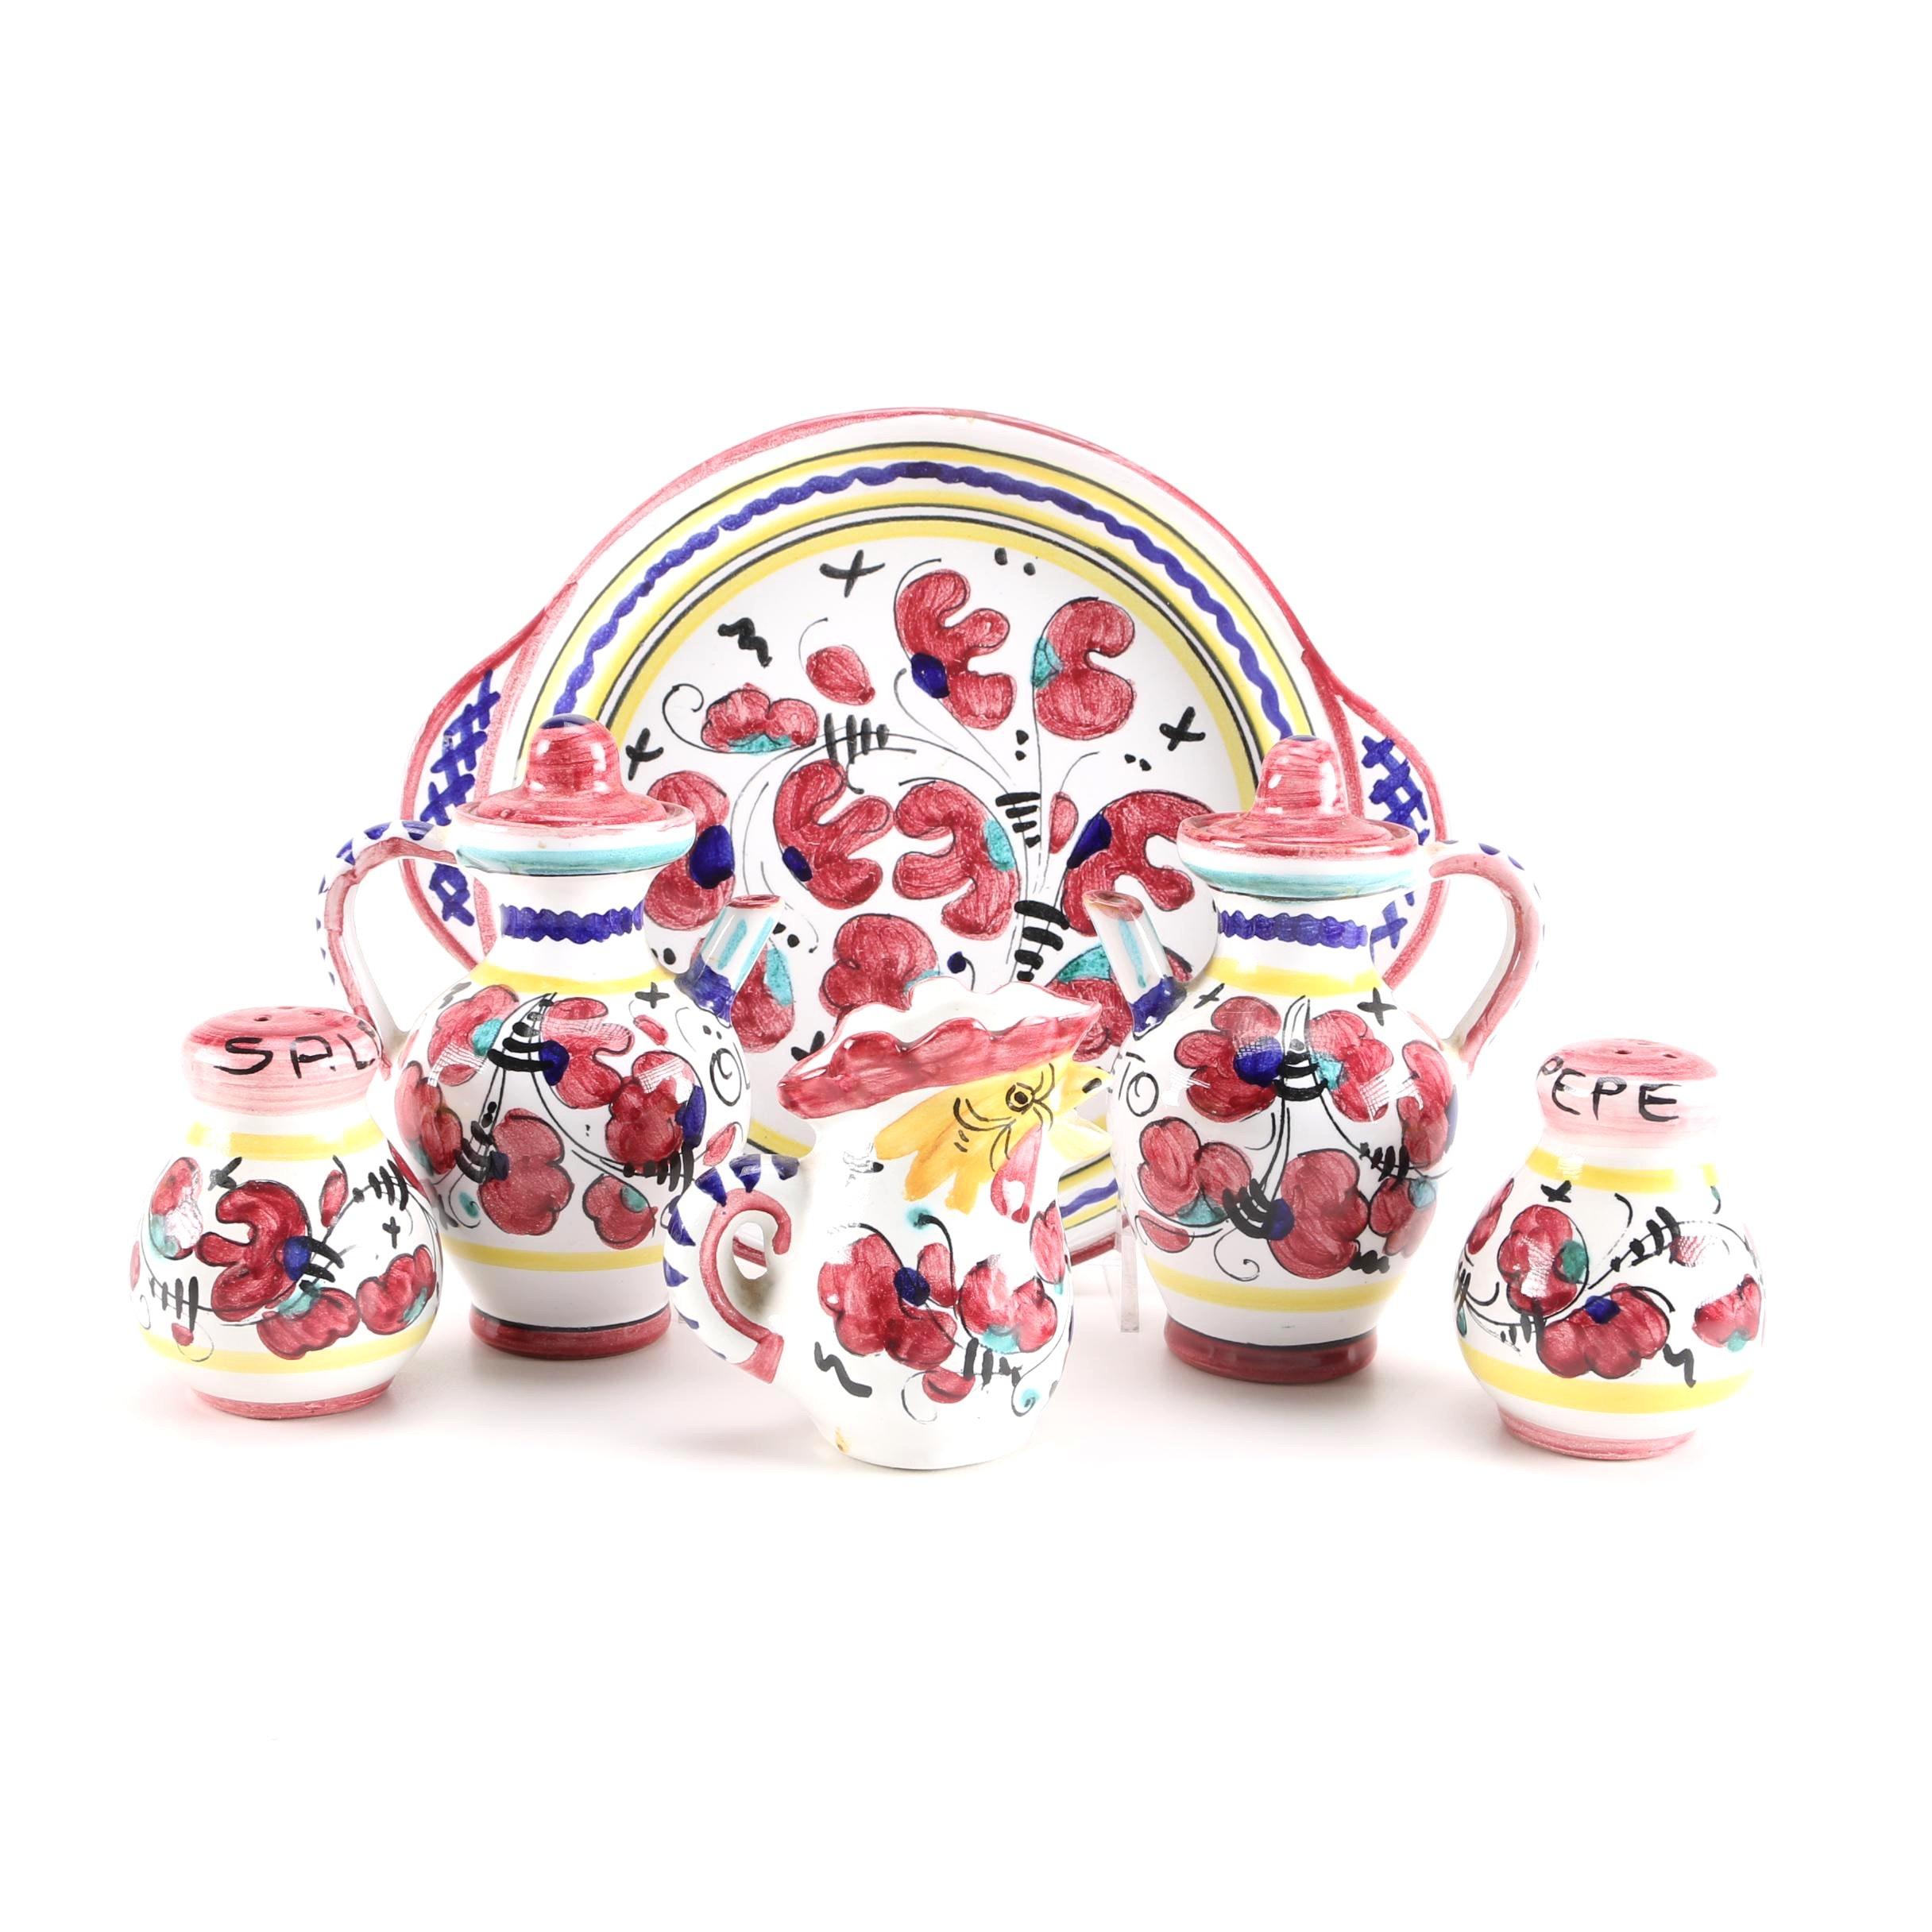 Deruta Italy Red Gallo Handpainted Serving Set